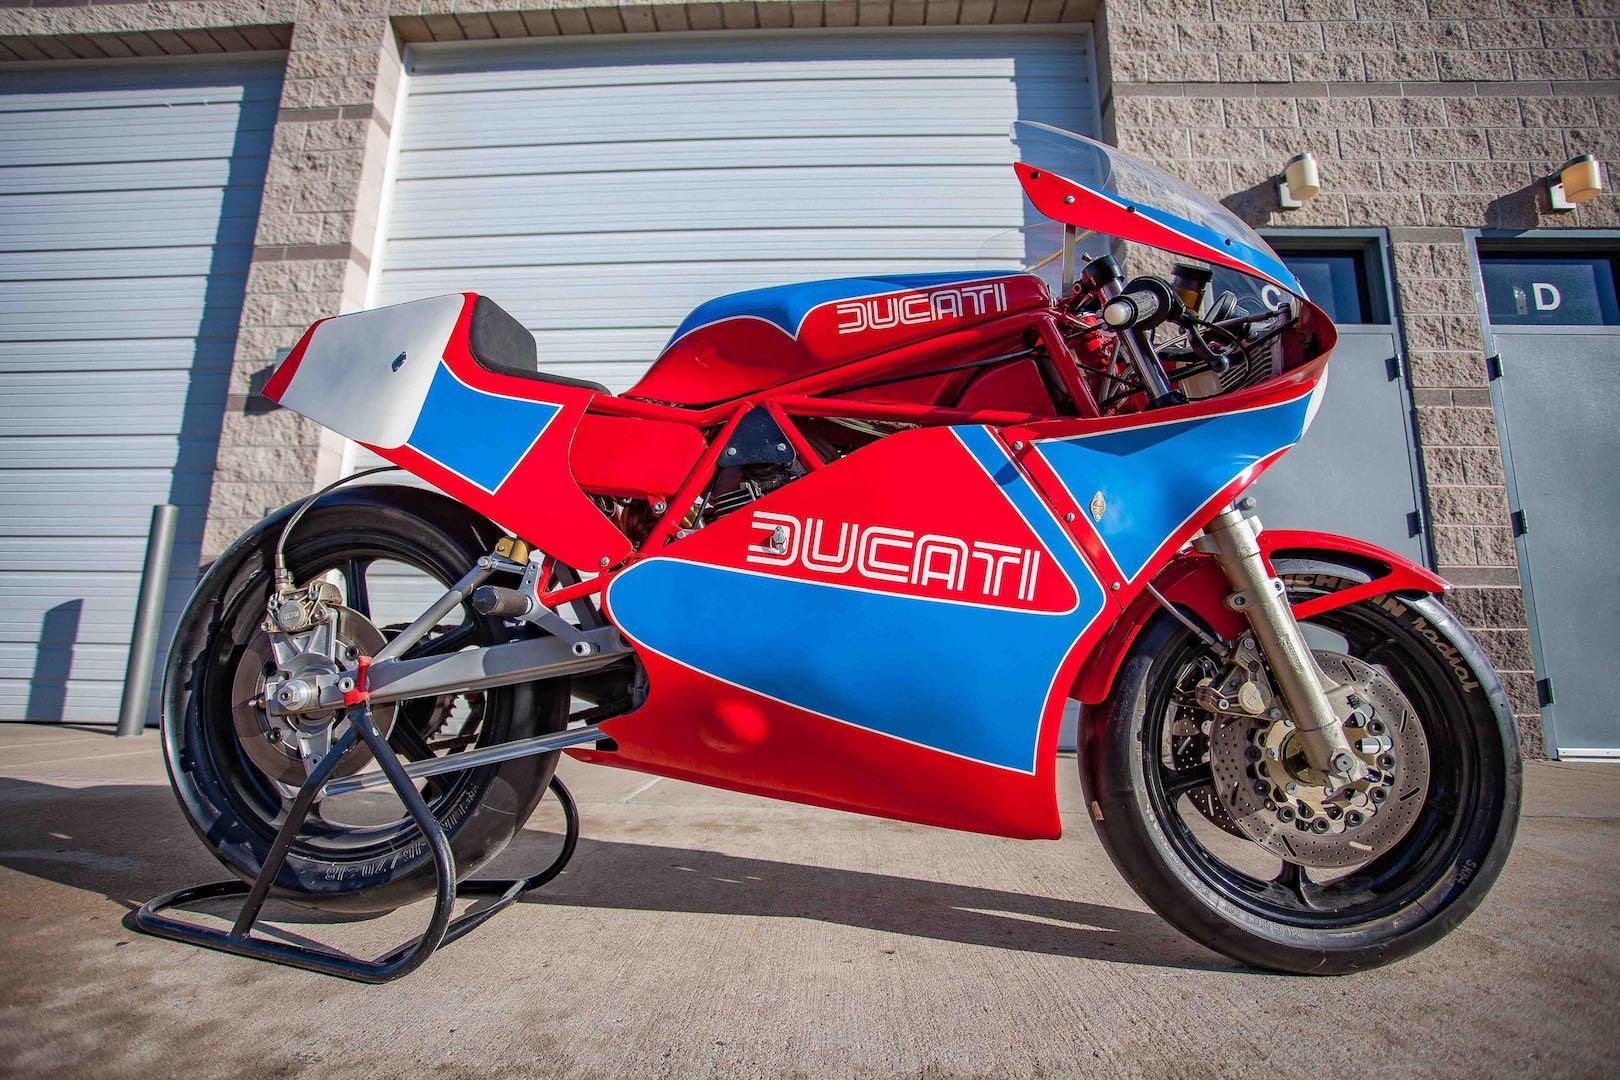 Bonhams Motorcycle Auction